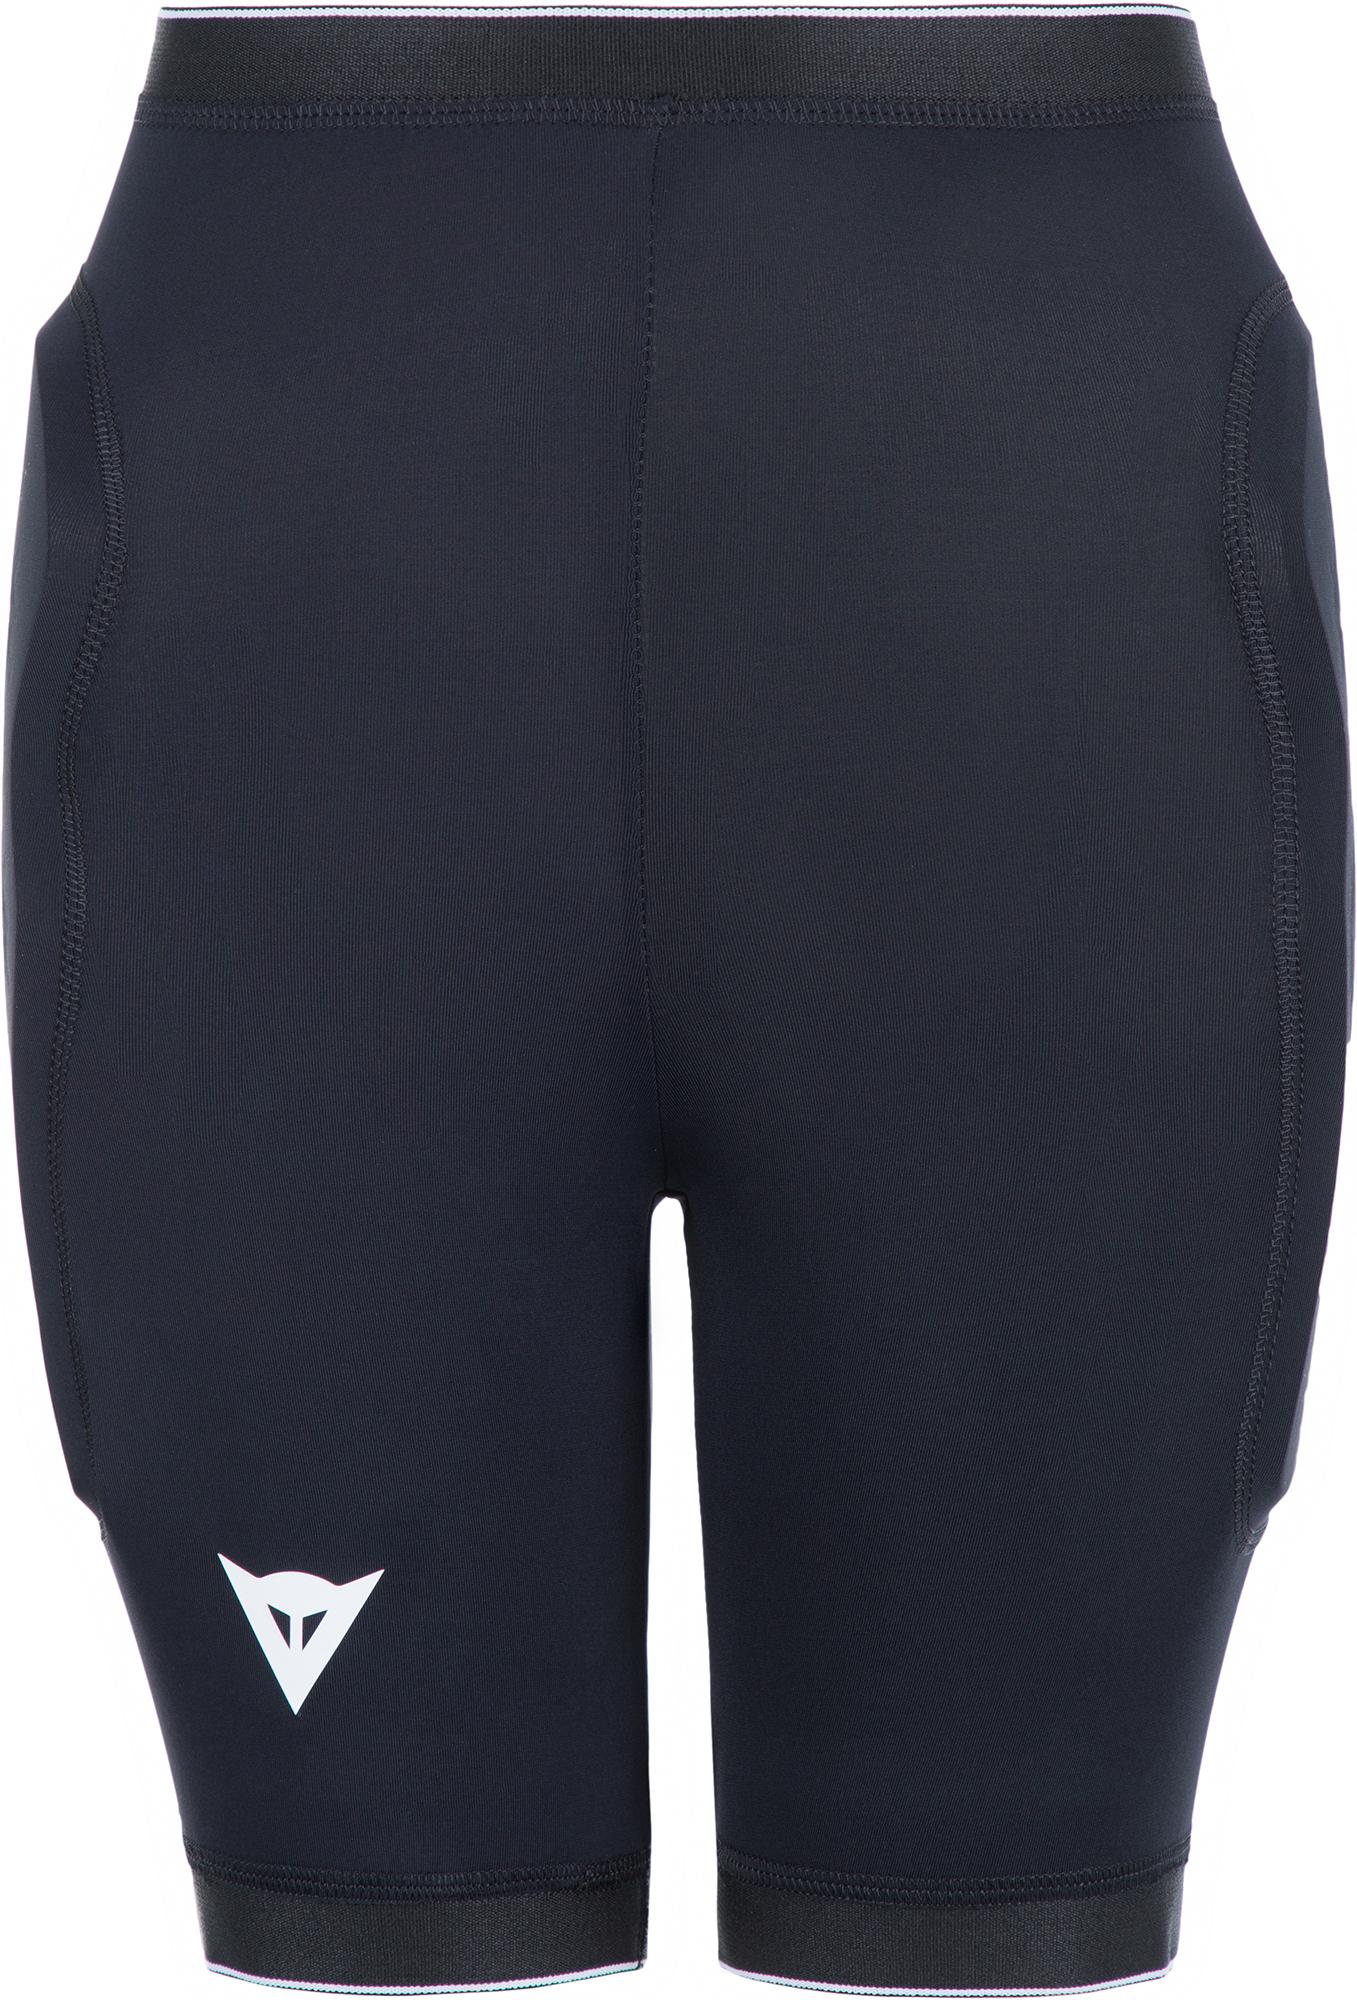 Dainese Шорты защитные детские Scarabeo Flex Shorts